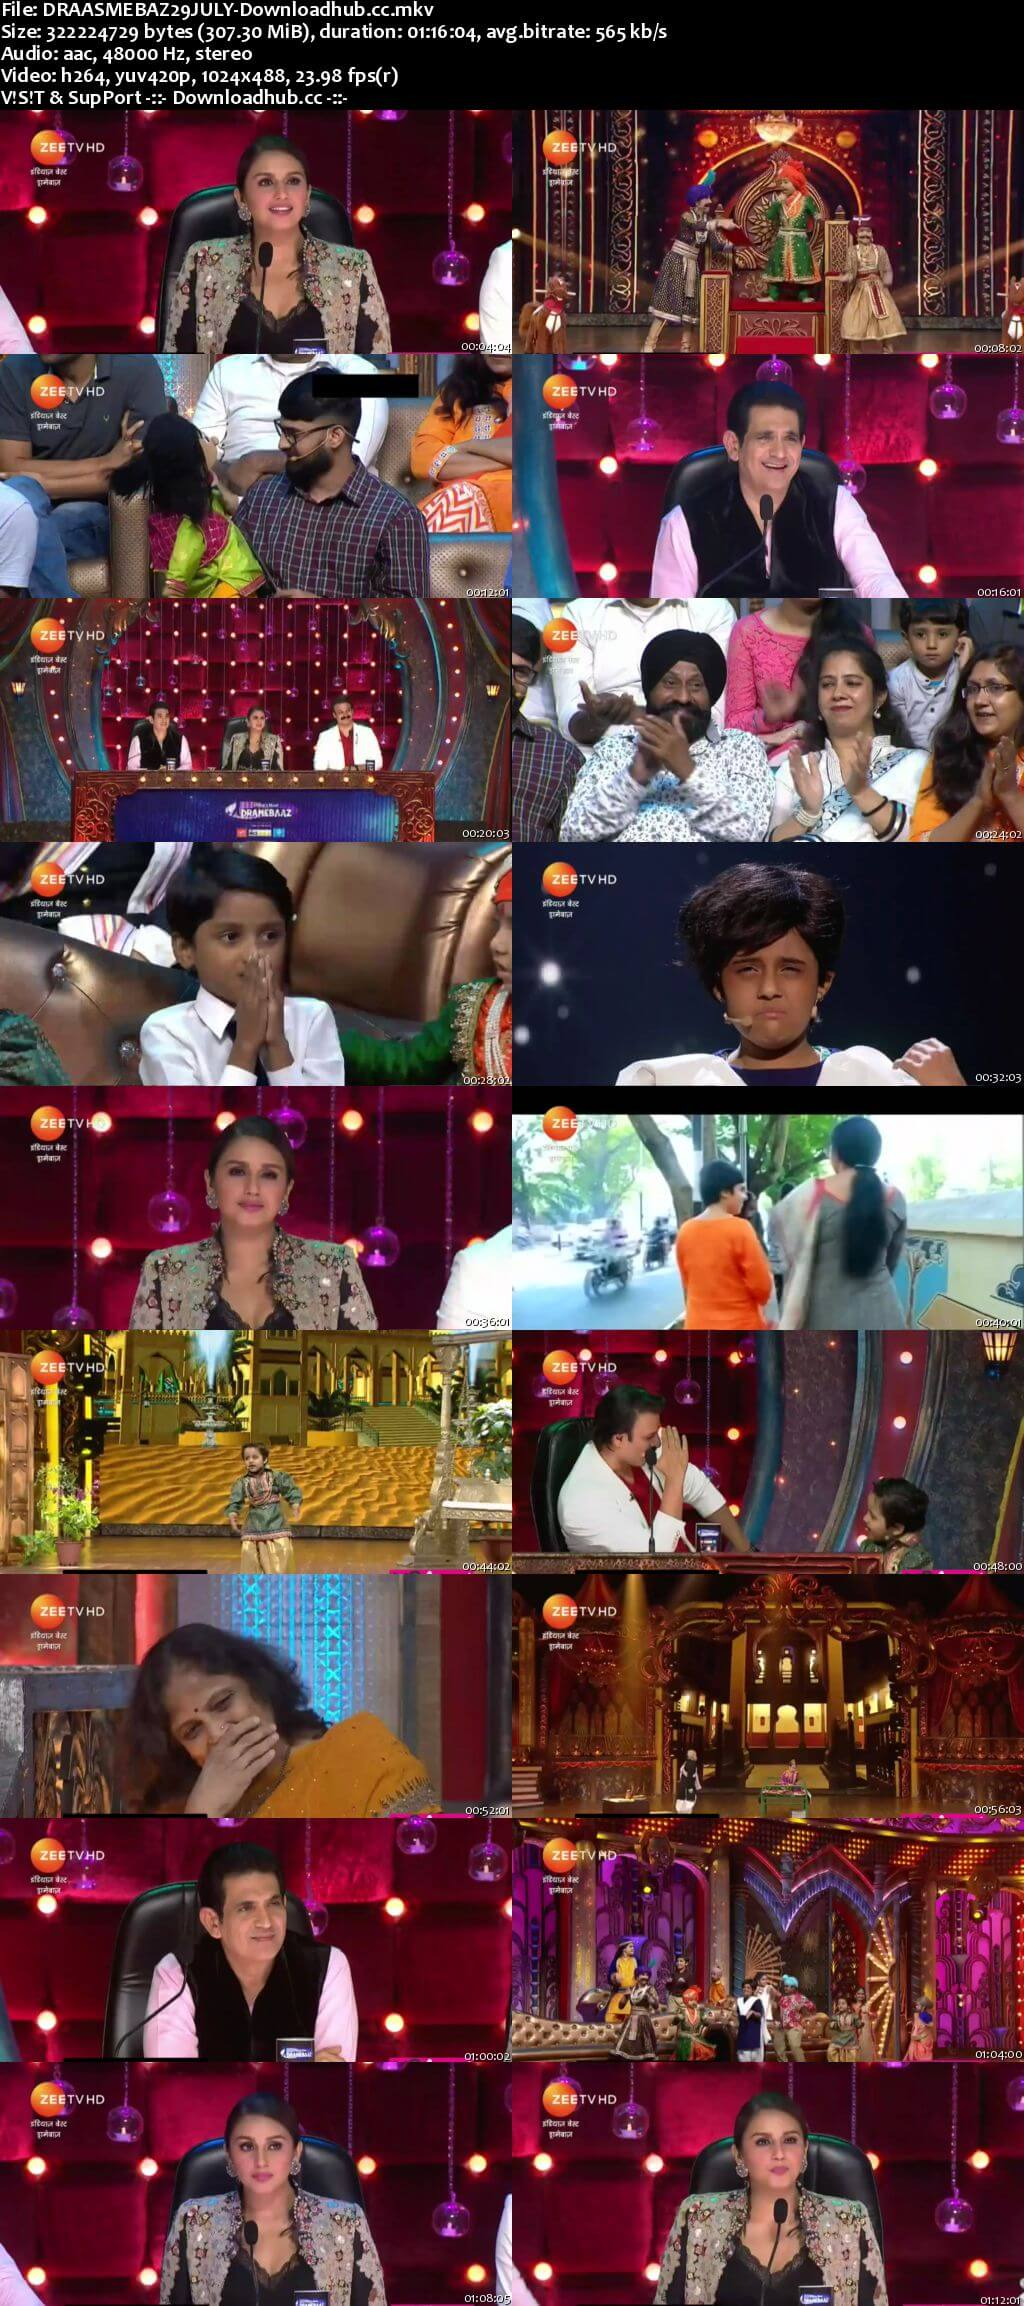 Indias Best Dramebaaz Season 3 29 July 2018 Episode 10 HDTV 480p